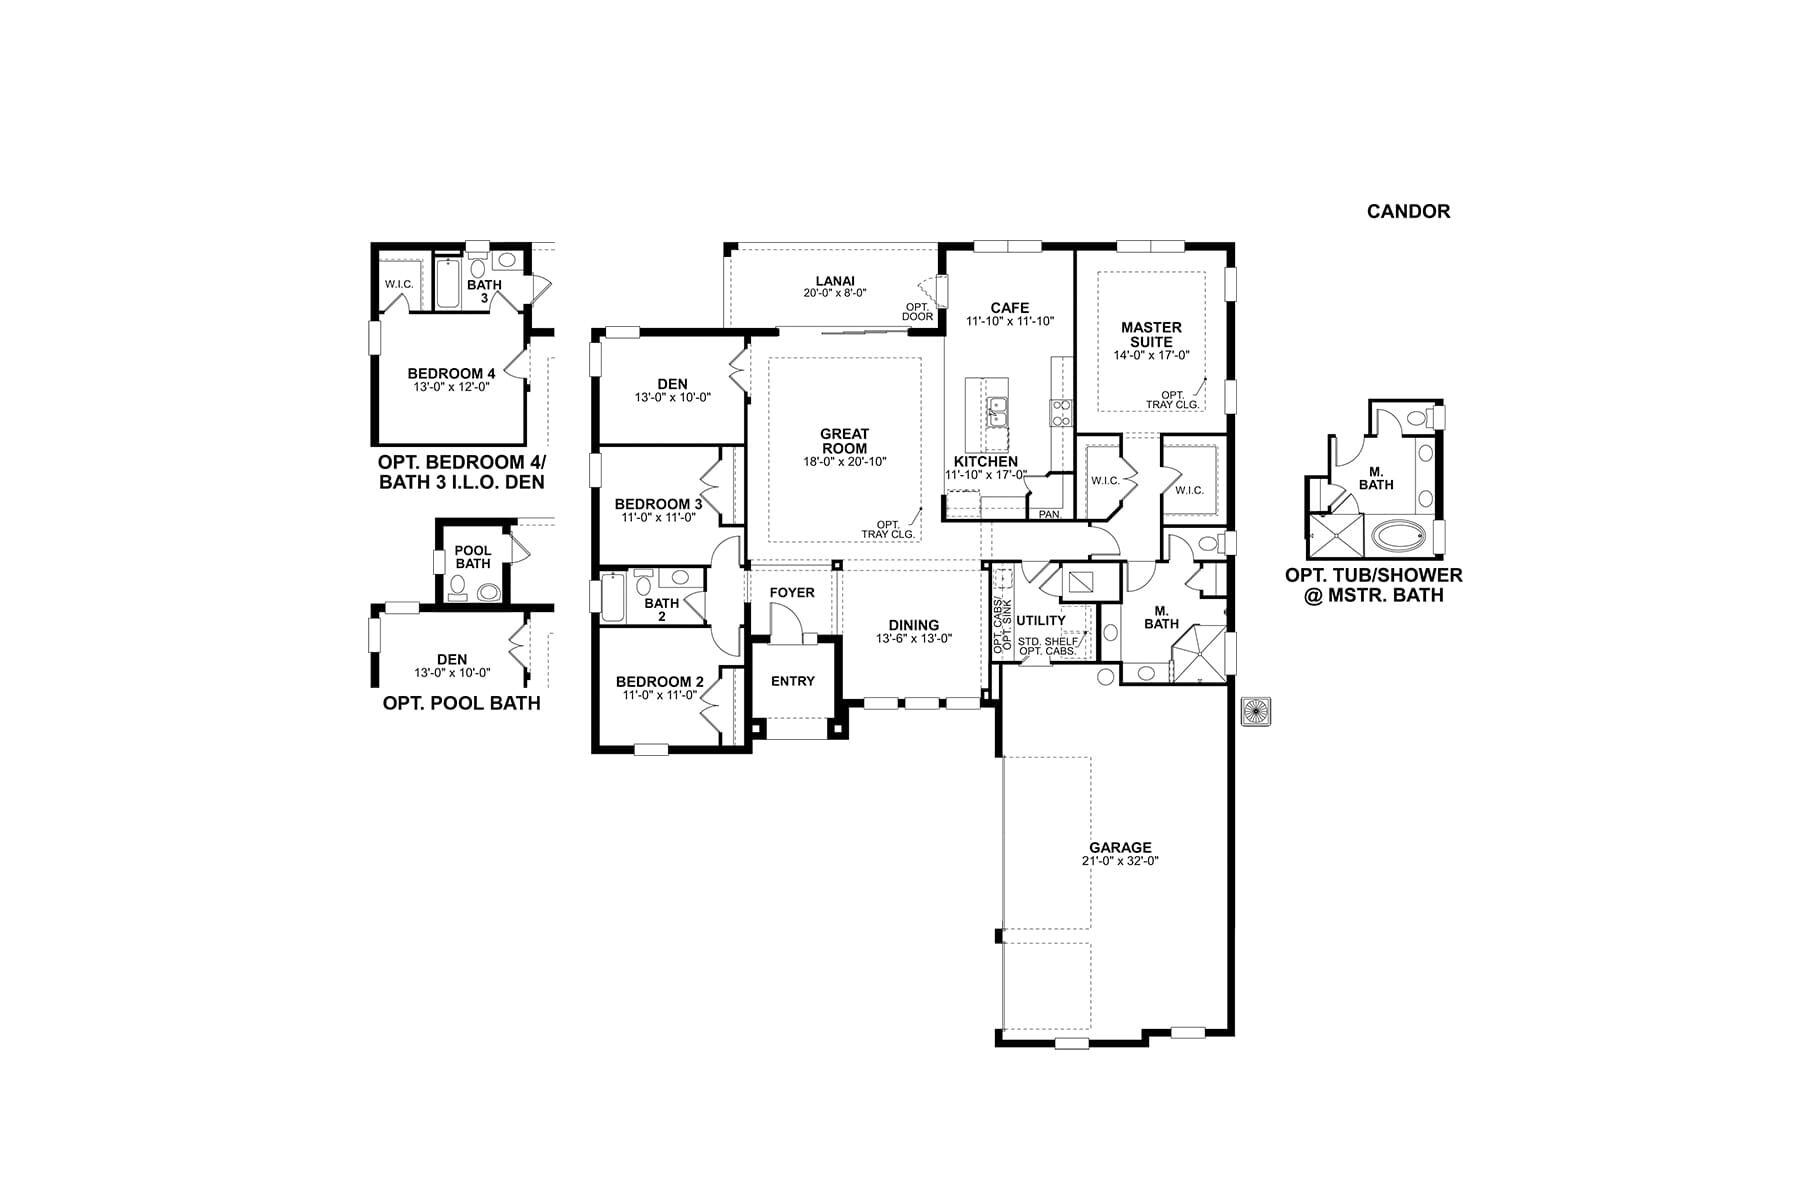 Candor First Floor